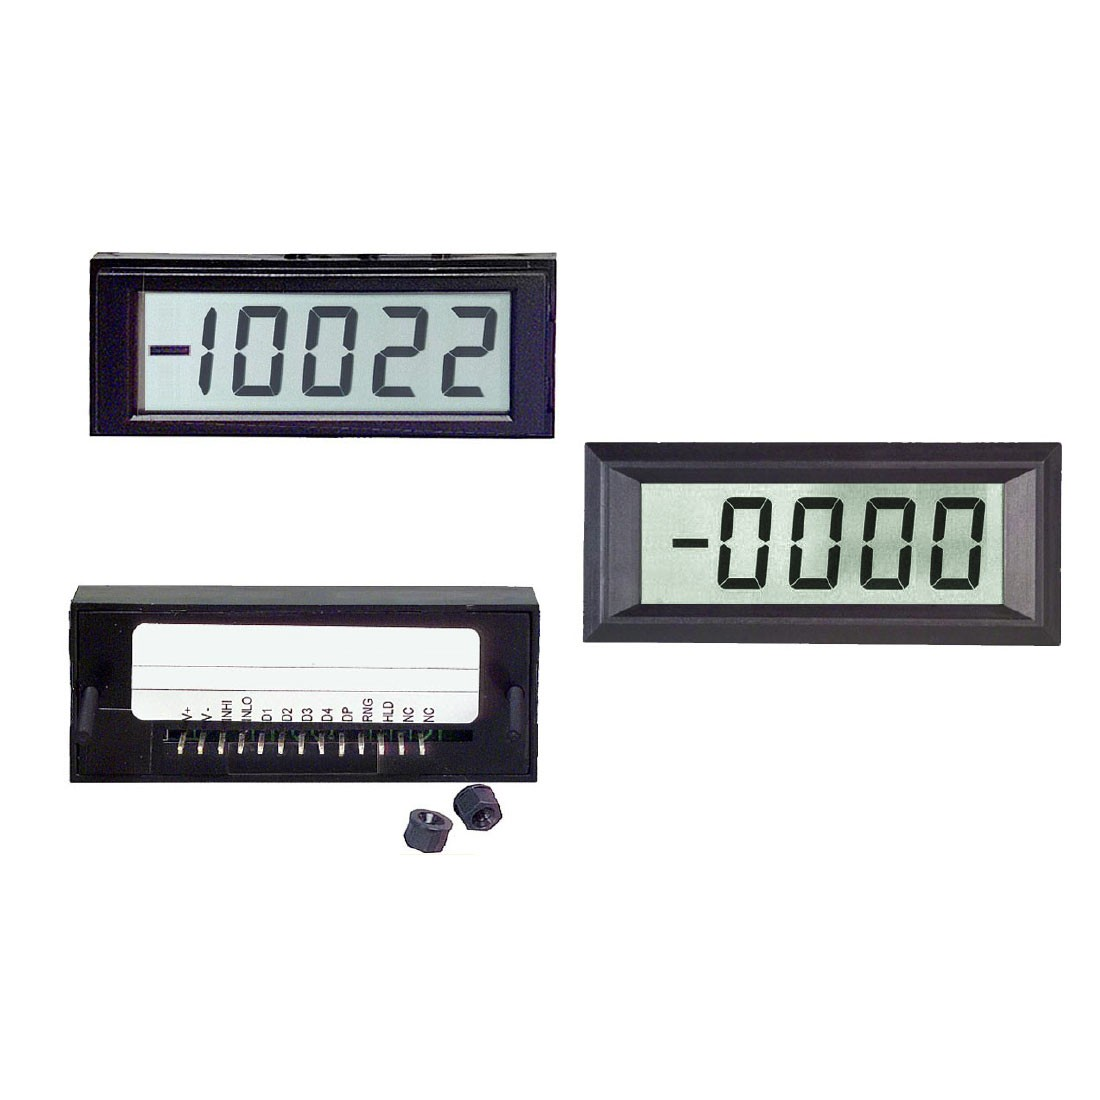 H4W Series LCD Digital Panel Meter